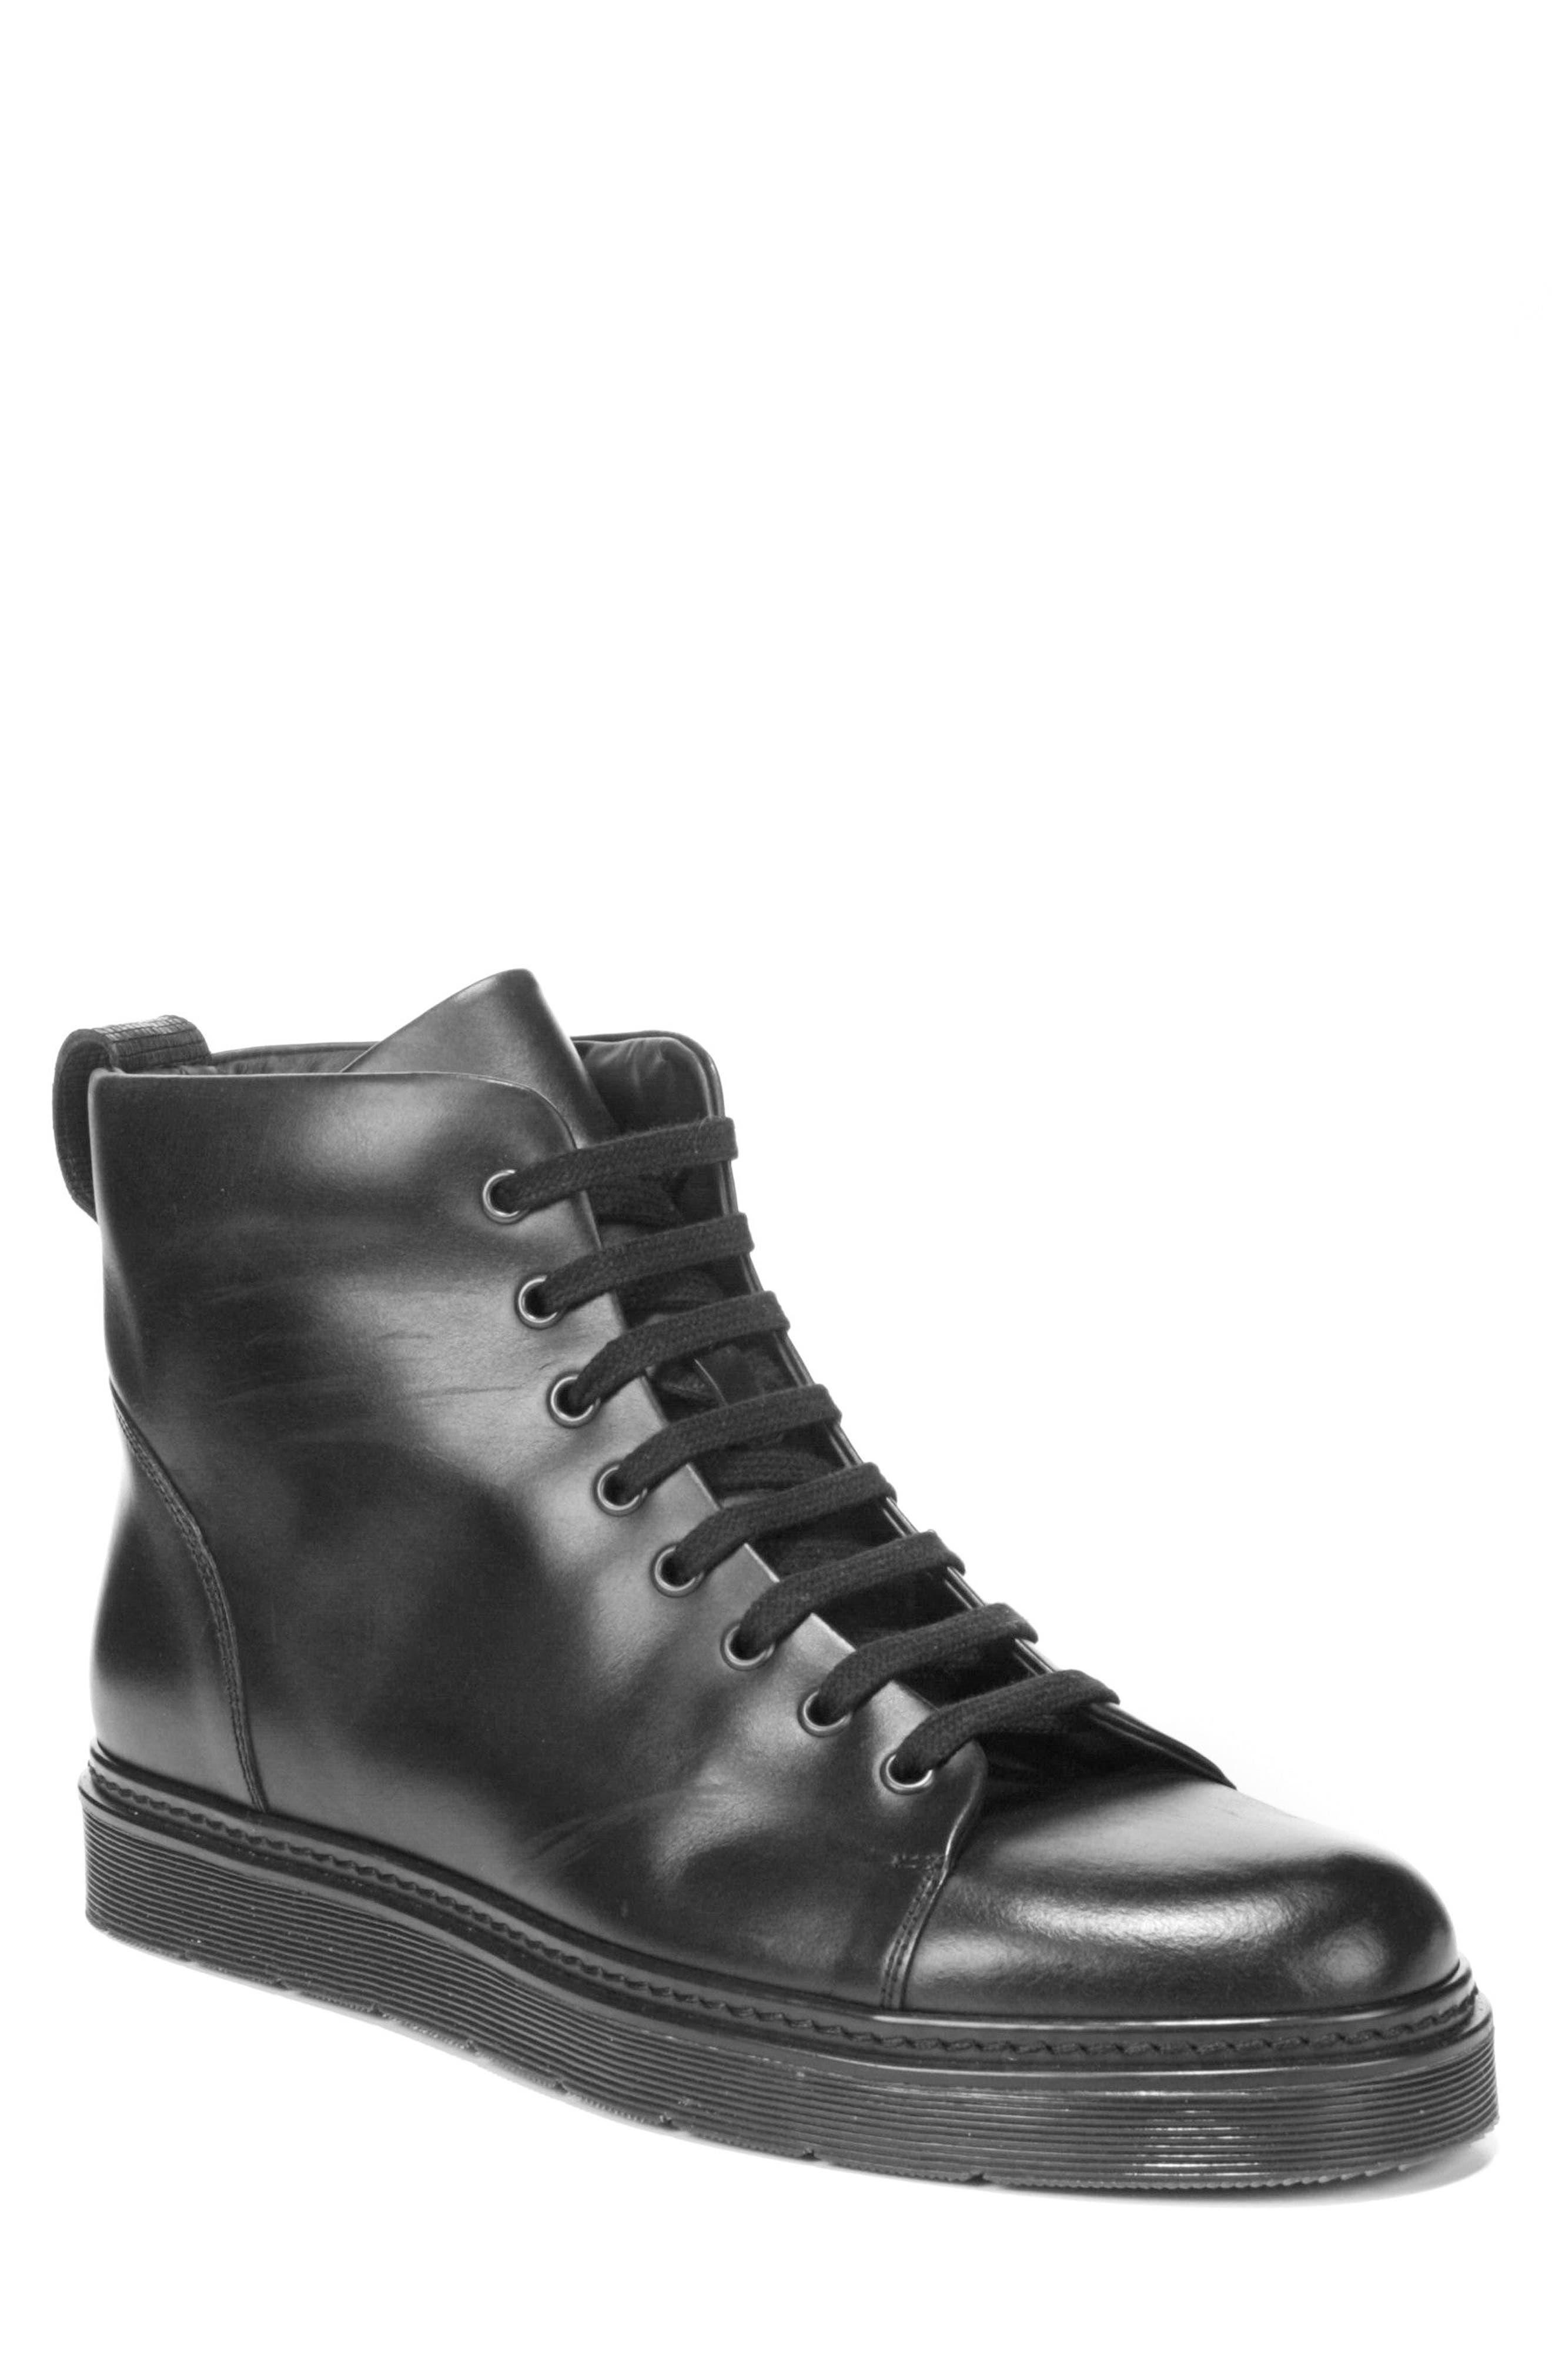 Malone Plain Toe Boot,                         Main,                         color, 001